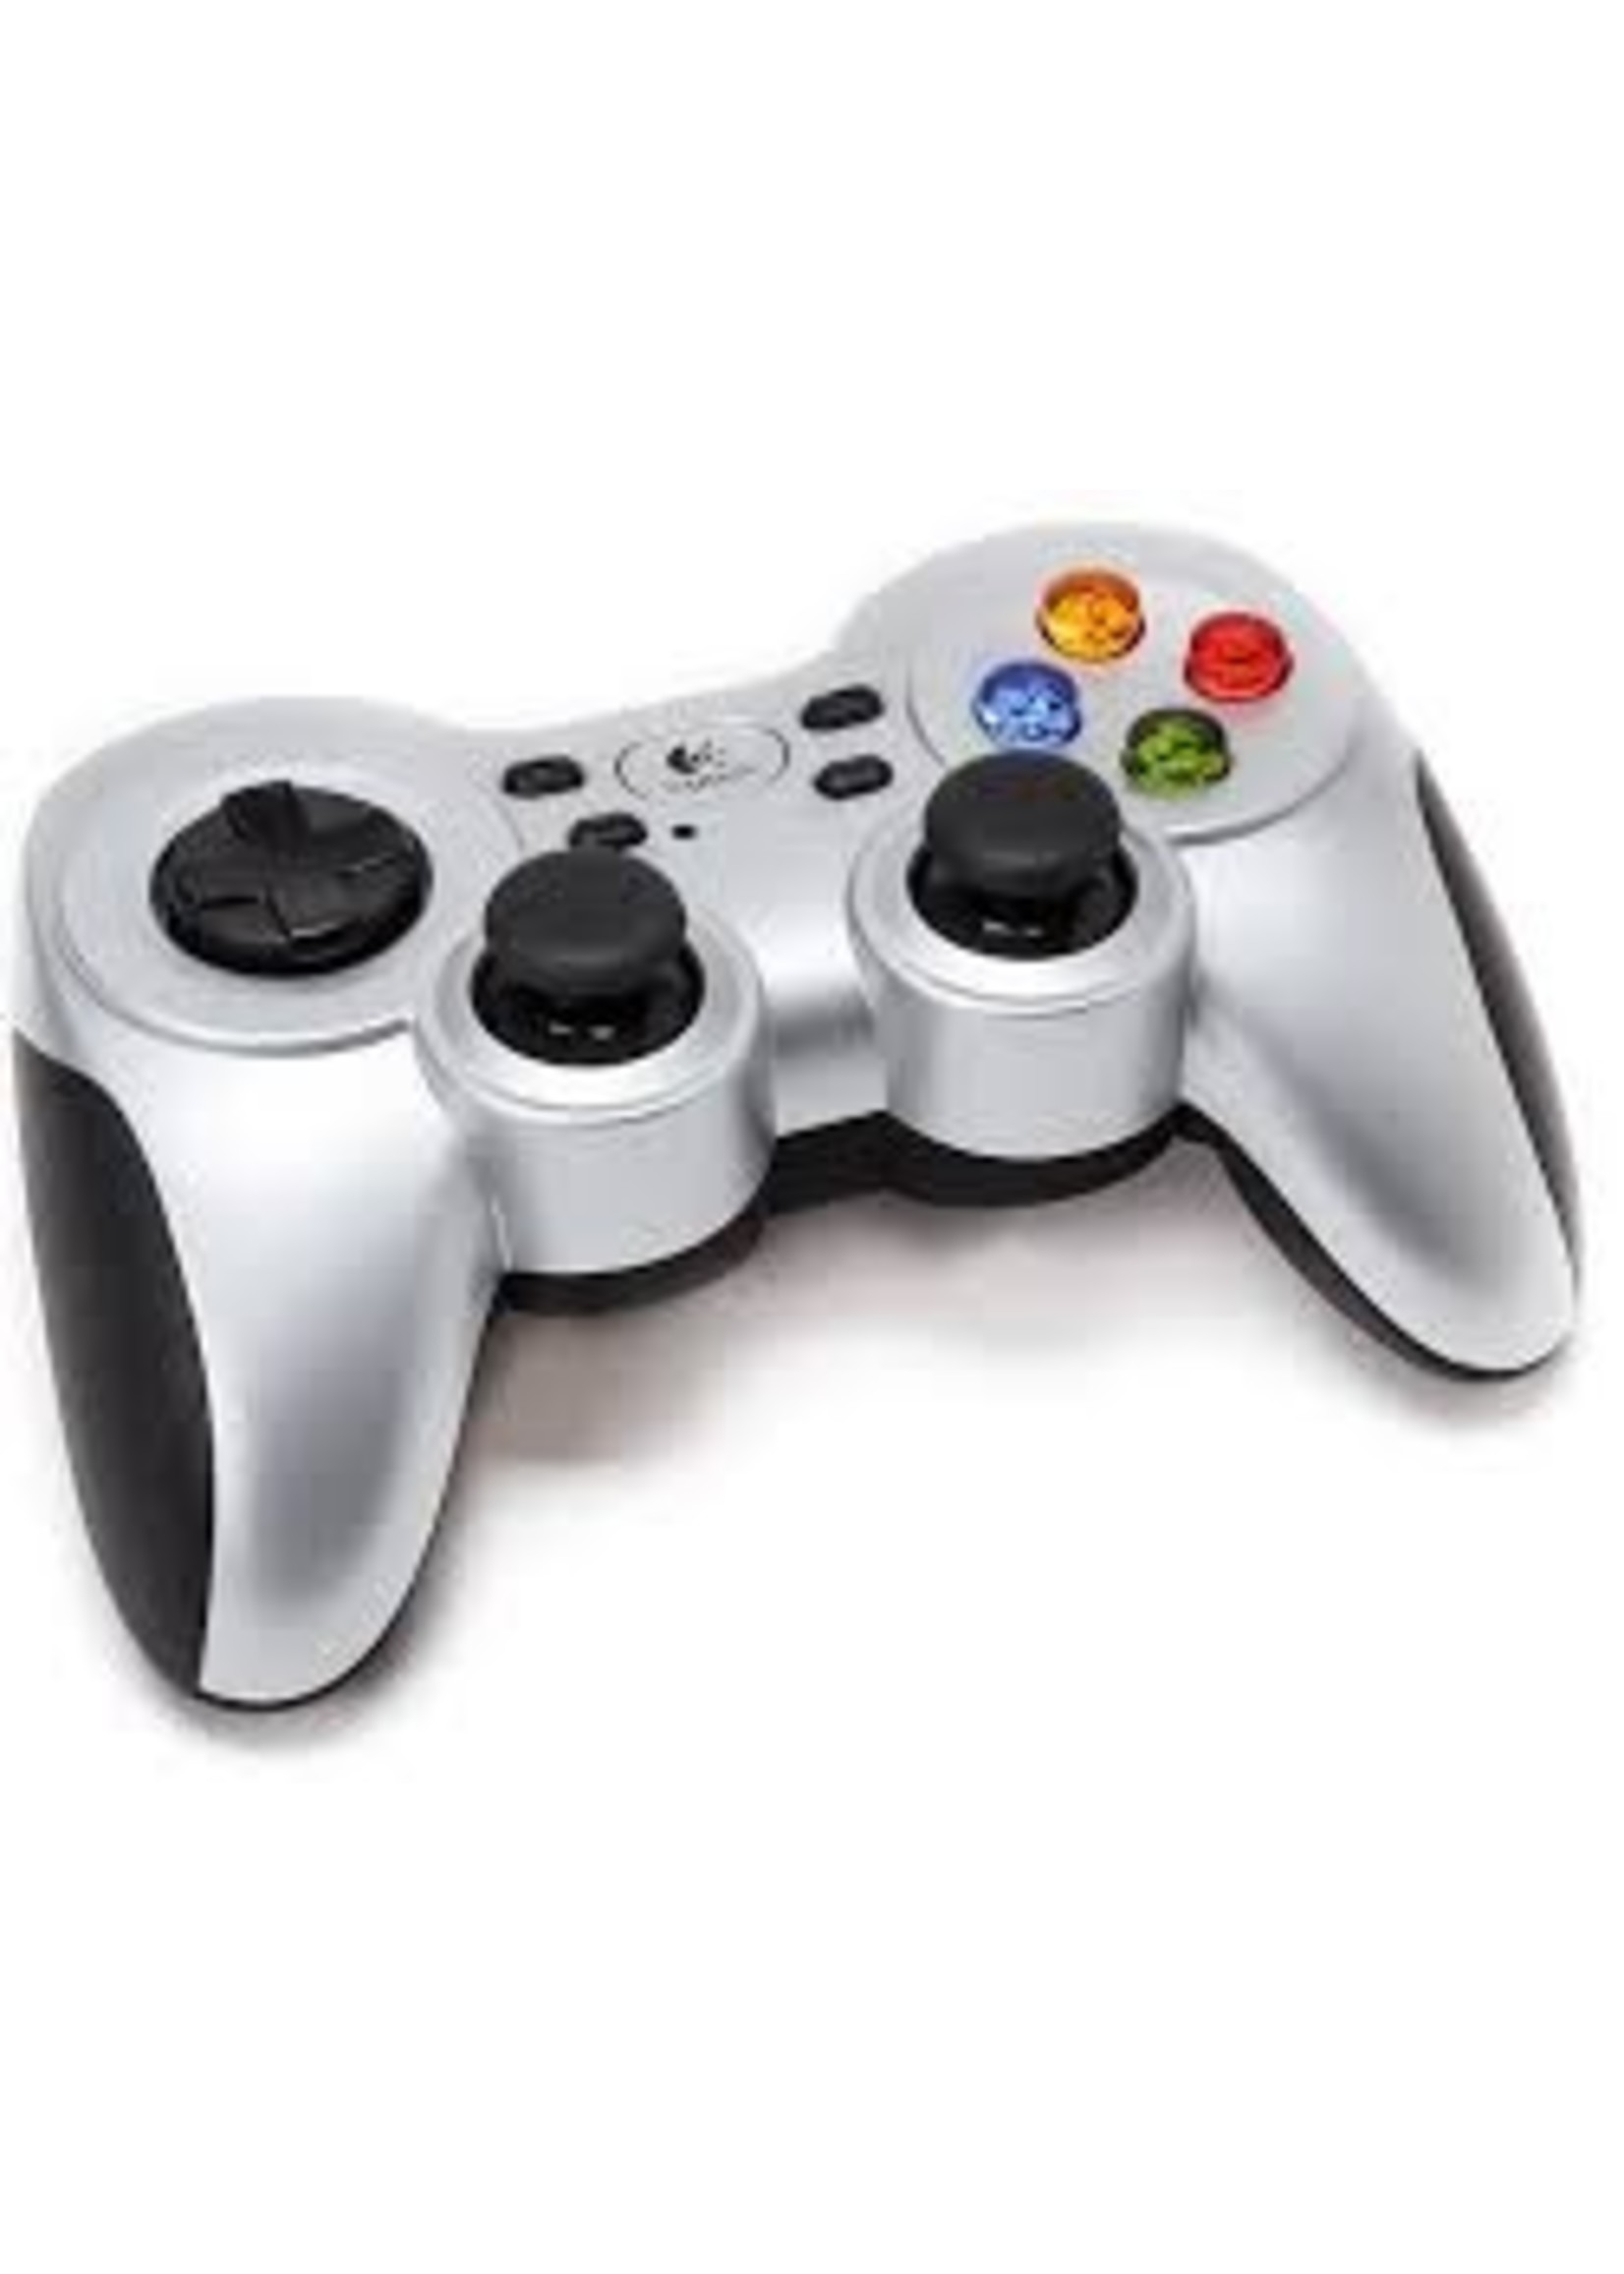 Controller - Logitech F710 PC Wireless